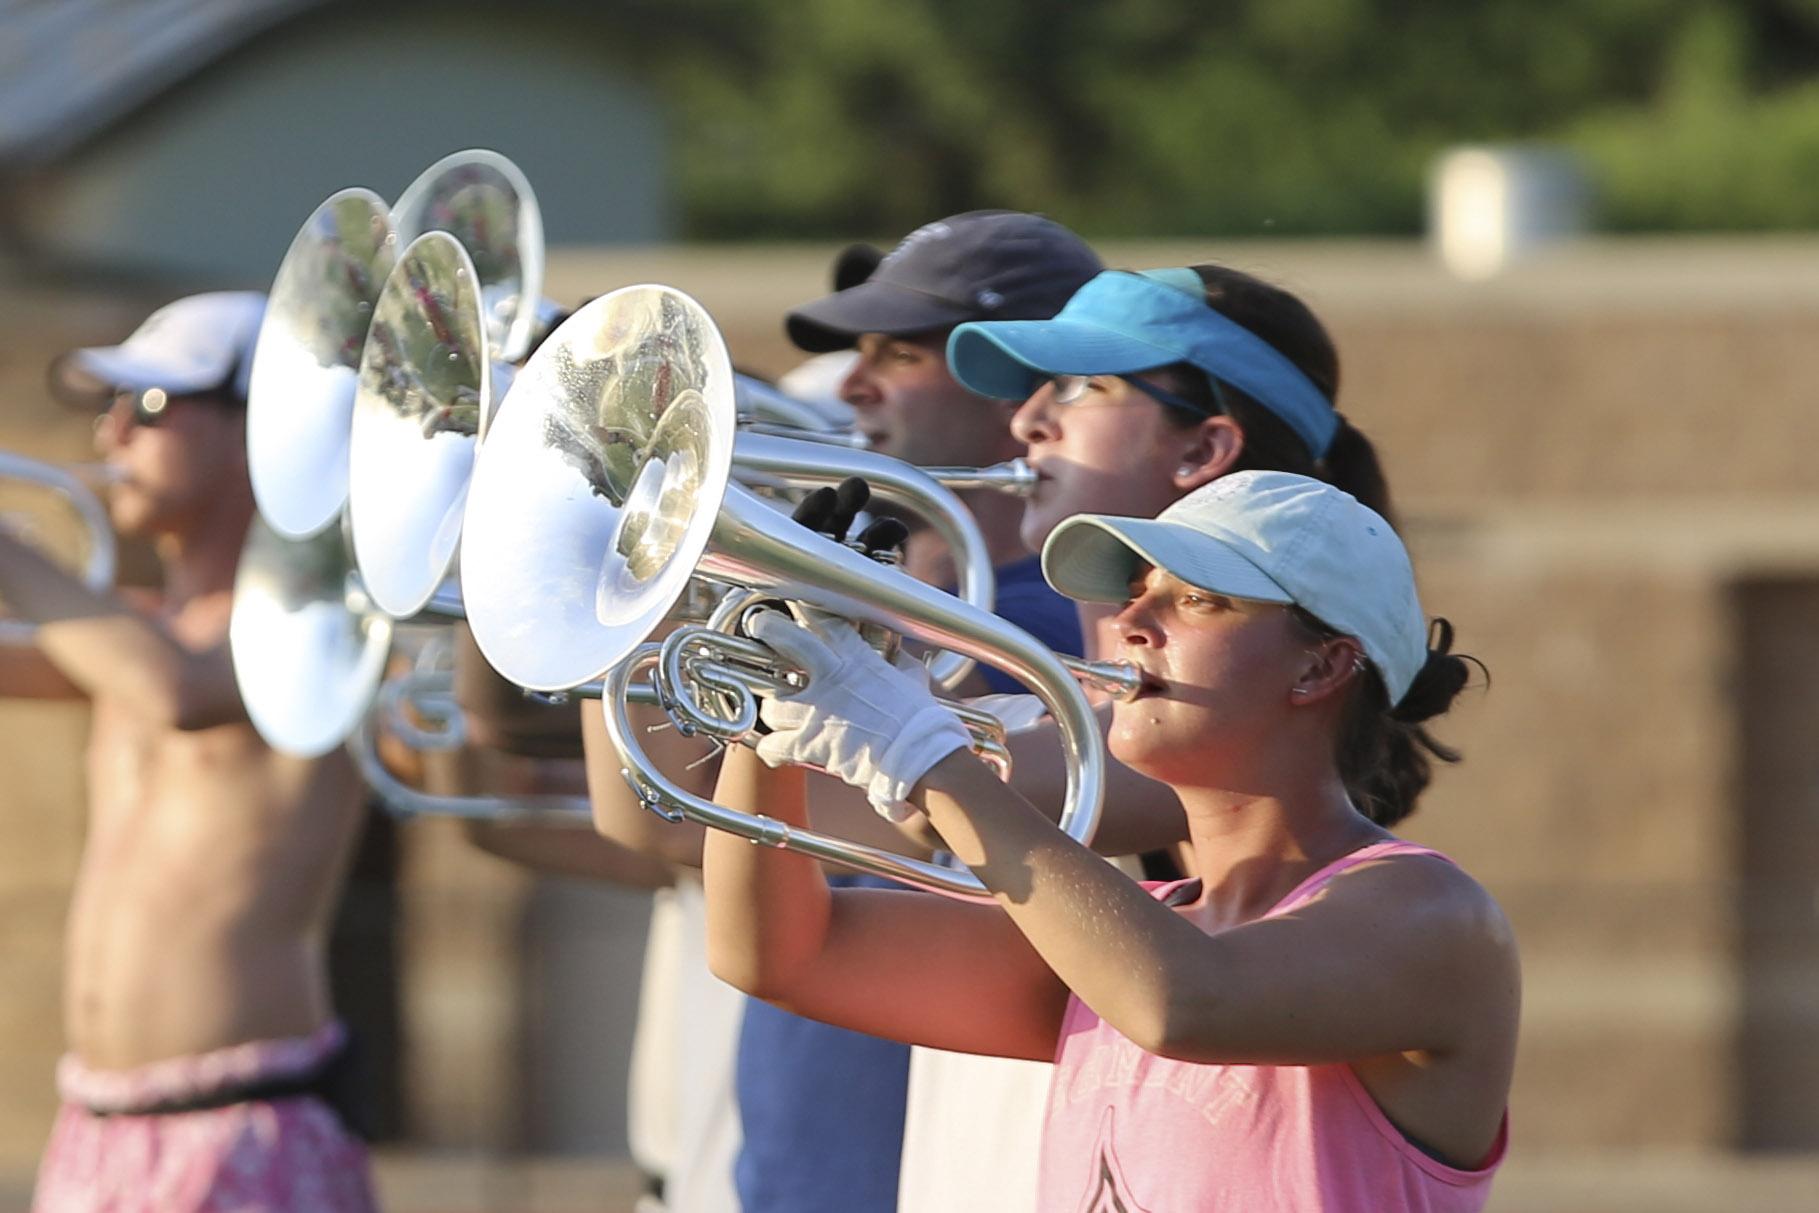 5e0503227ebc43 MACOMB, IL – The world champion Phantom Regiment Drum and Bugle Corps began  its summer training camp on the campus of Western Illinois University  Sunday, ...